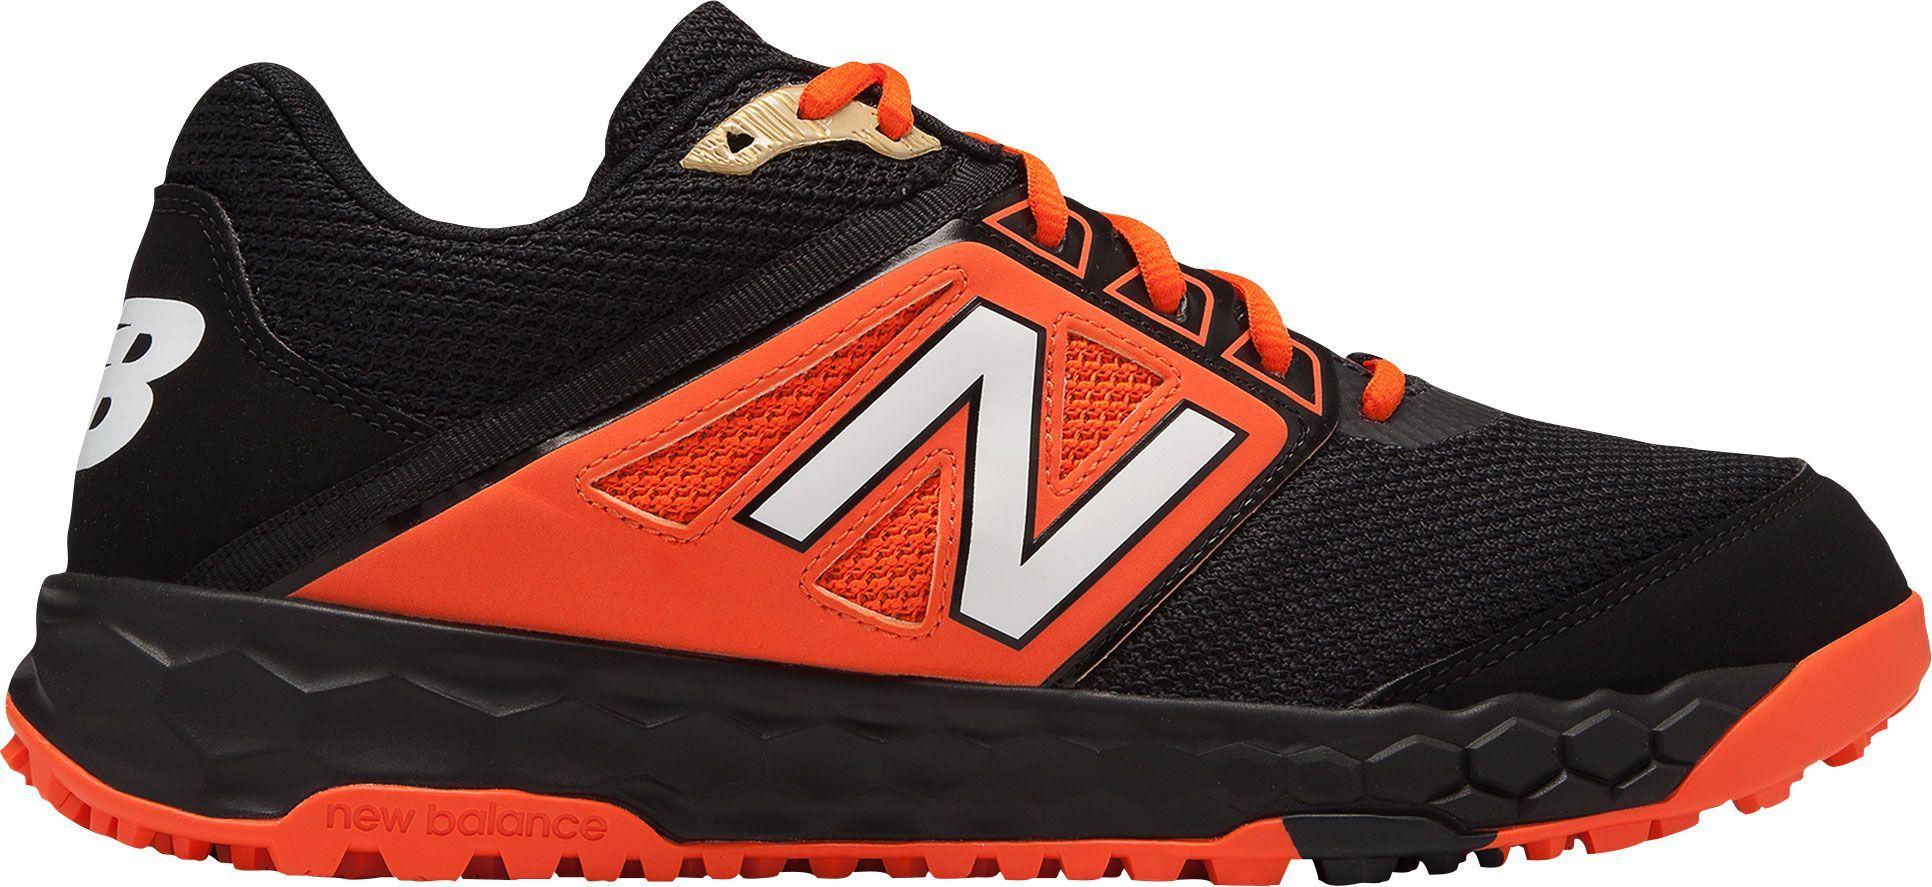 e06fbaeb8 New Balance Men's 3000 V4 Turf Baseball Cleats, Size: 5.0, Black in ...